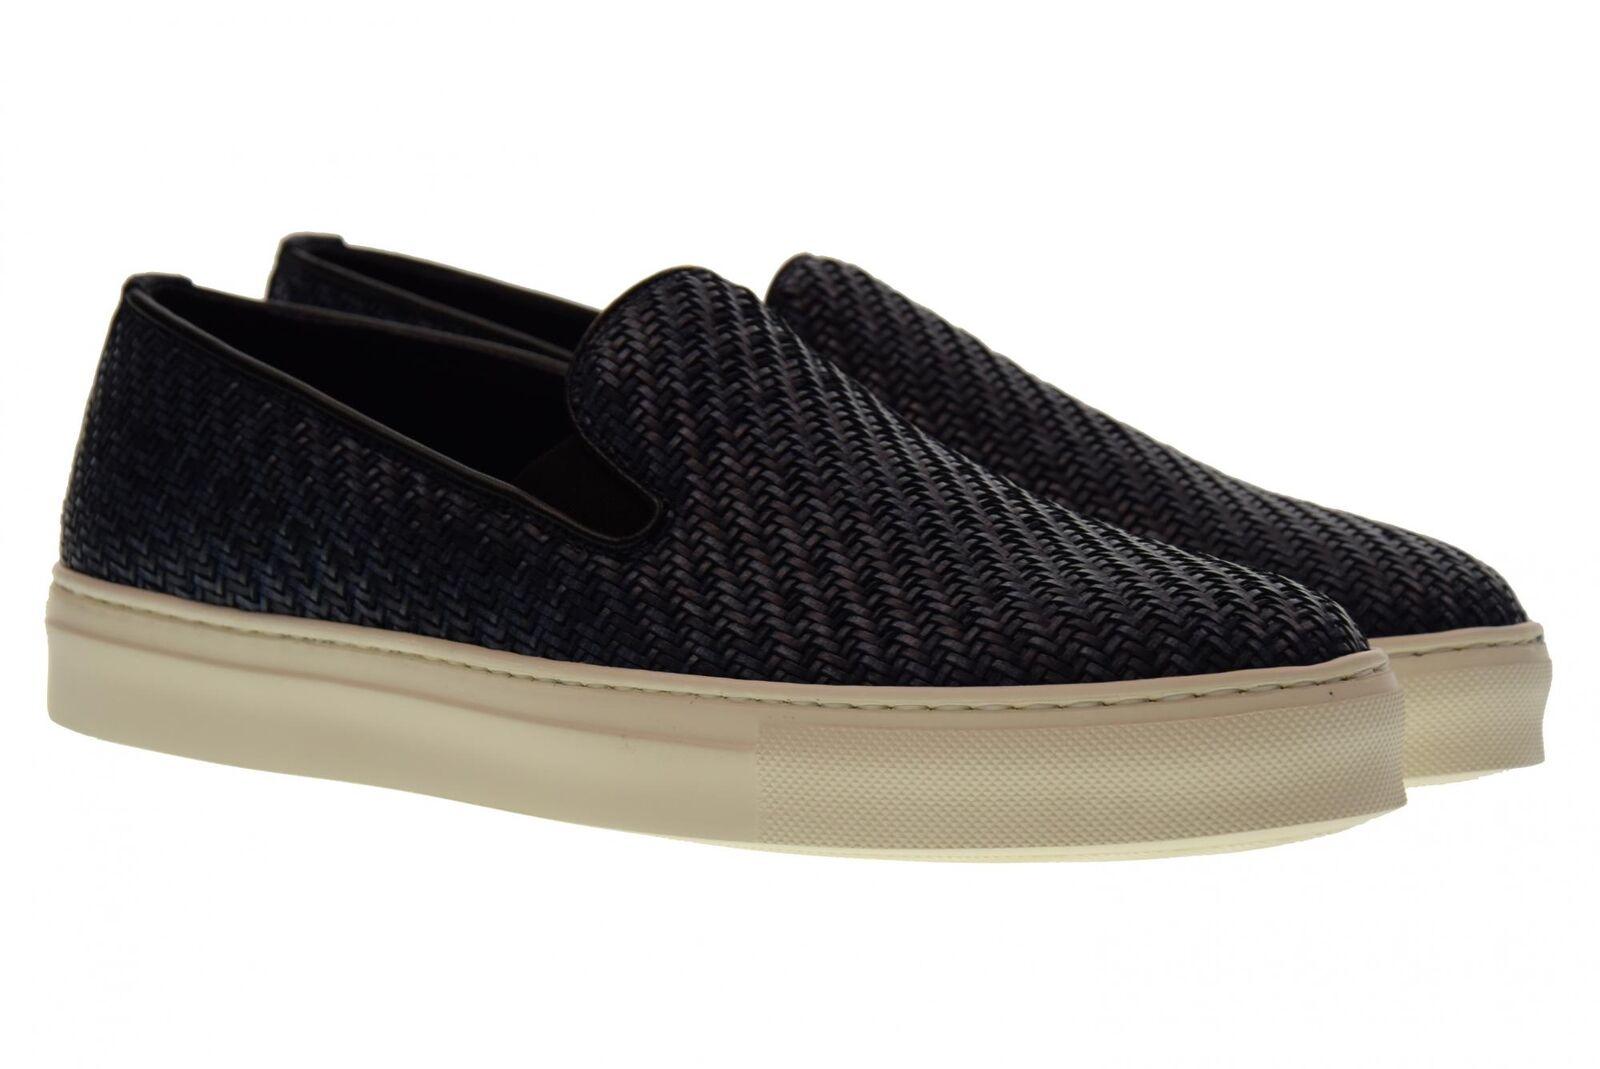 Antica Cuoieria P18us shoes men slip on 20123-I-V06 INTRICCIO KIRA blueE